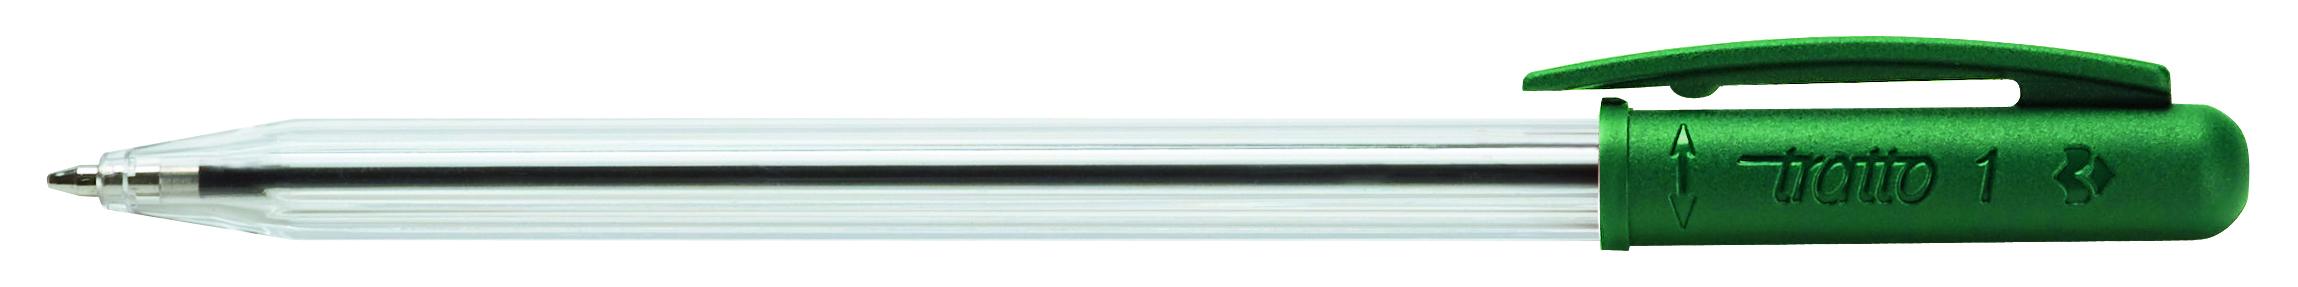 Ручка шариковая Tratto 1 зеленая поворот 1мм